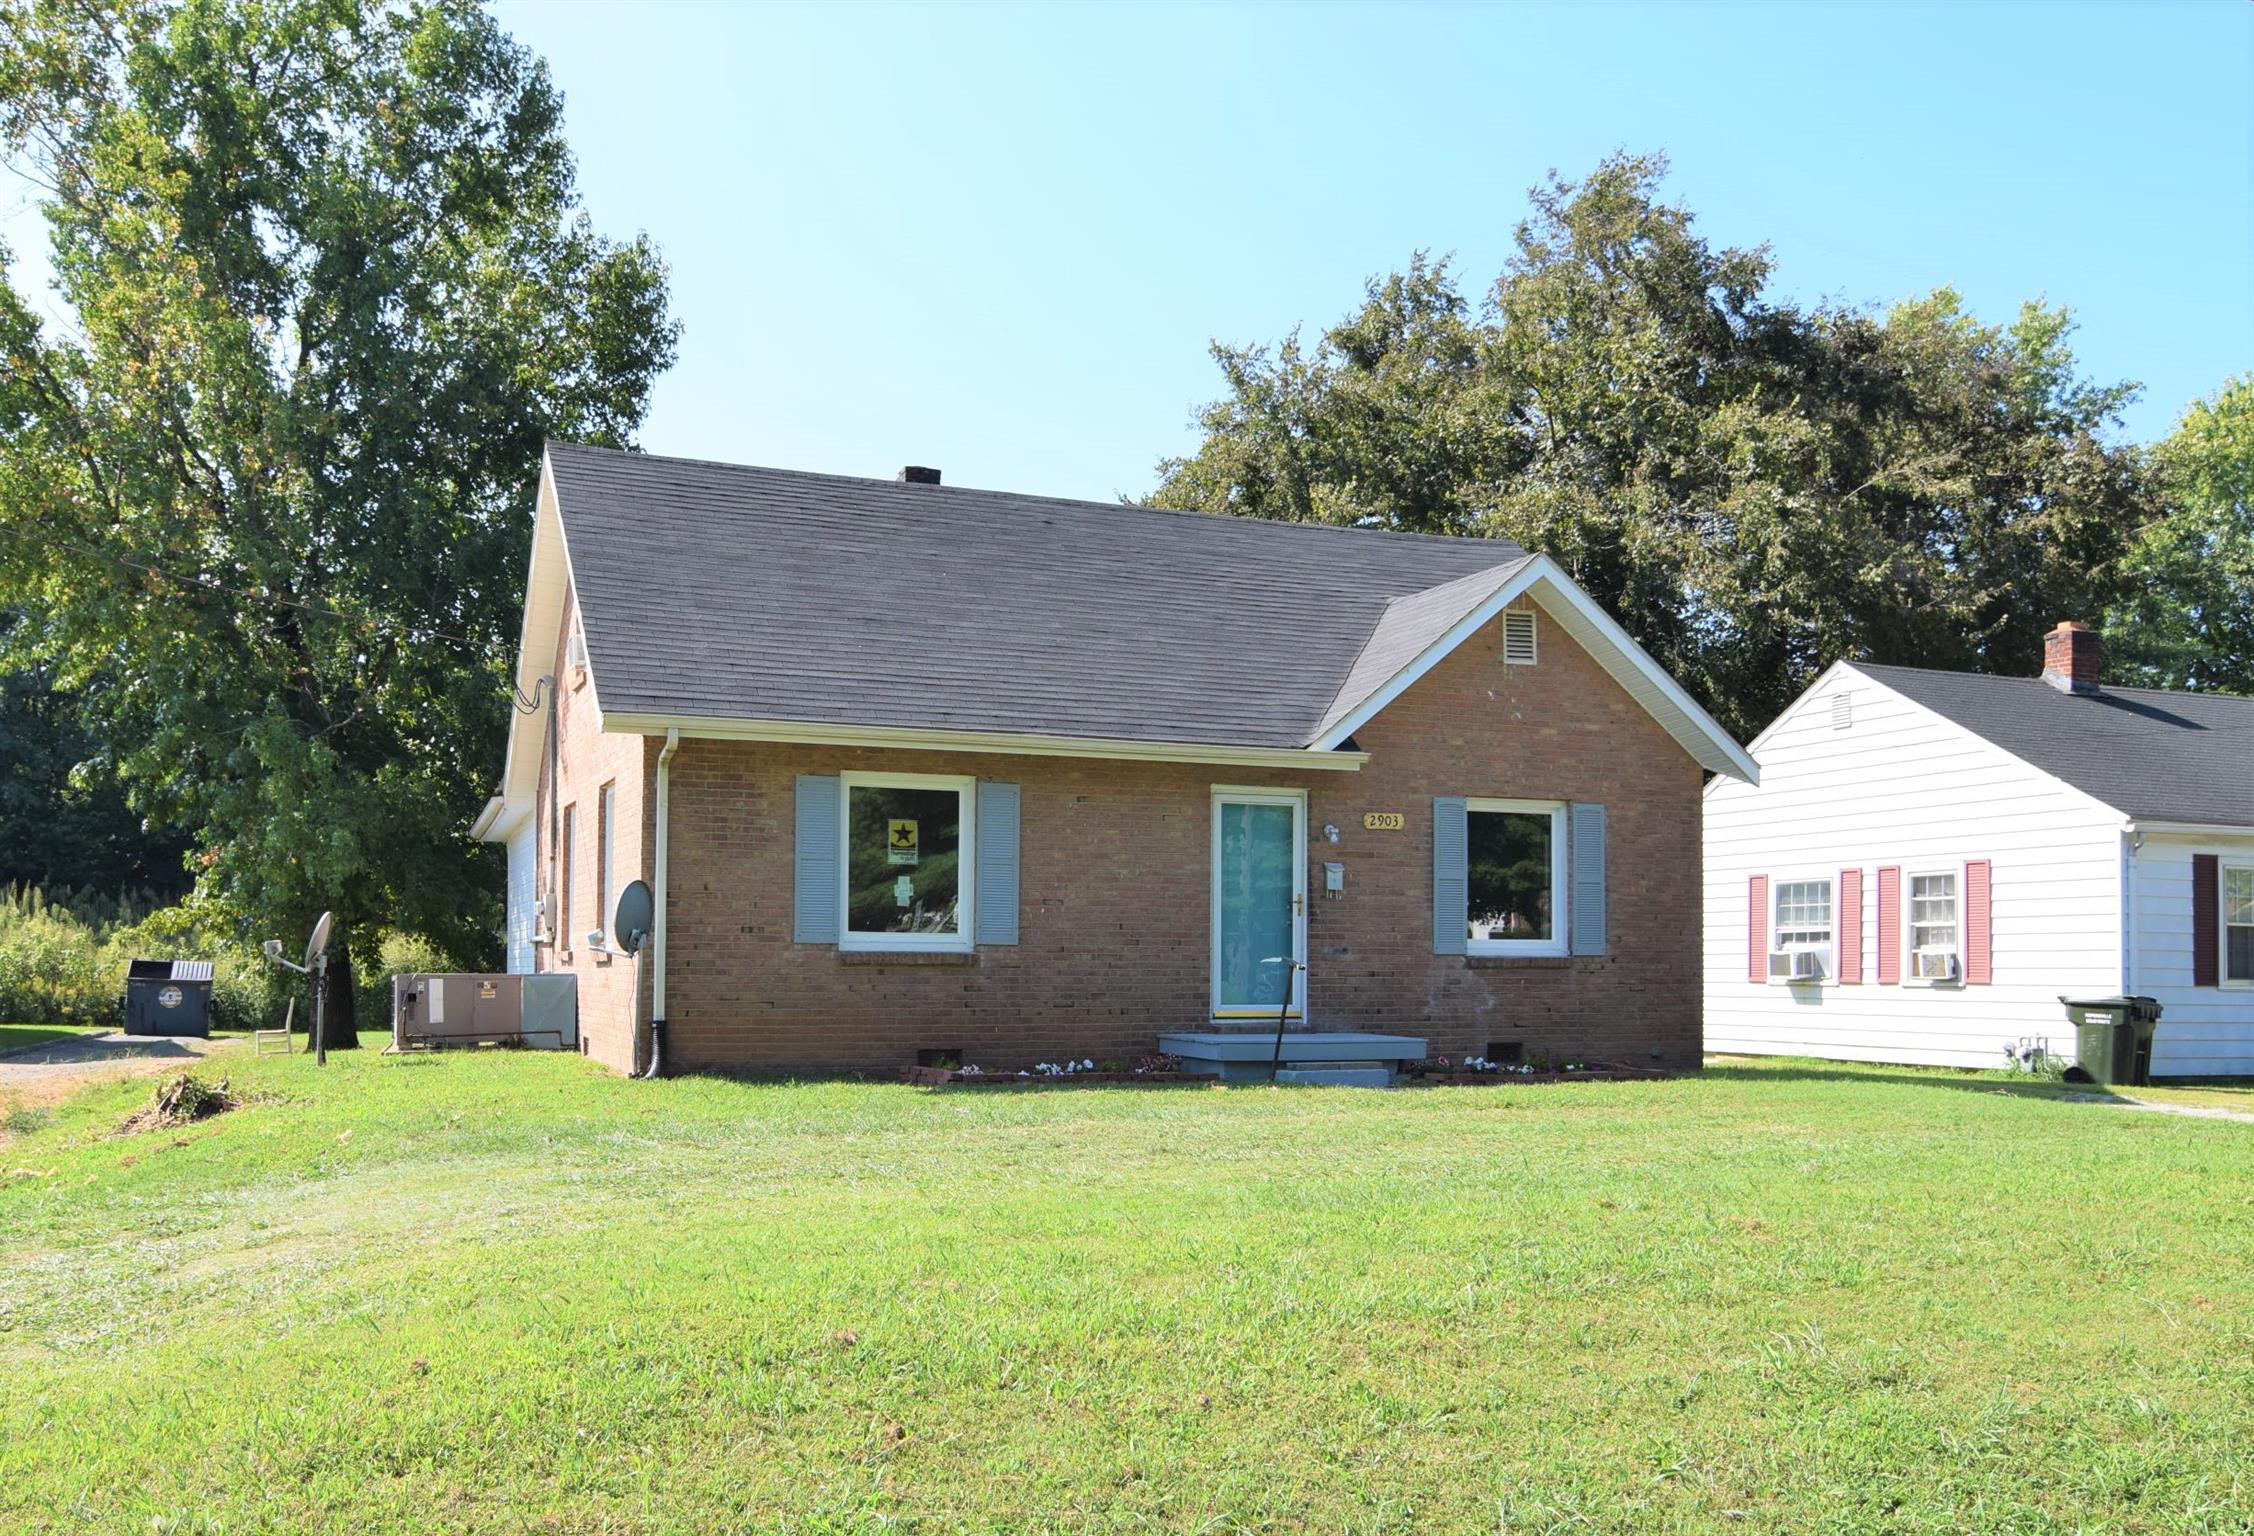 2903 Virginia St, S, Hopkinsville, KY 42240 - Hopkinsville, KY real estate listing